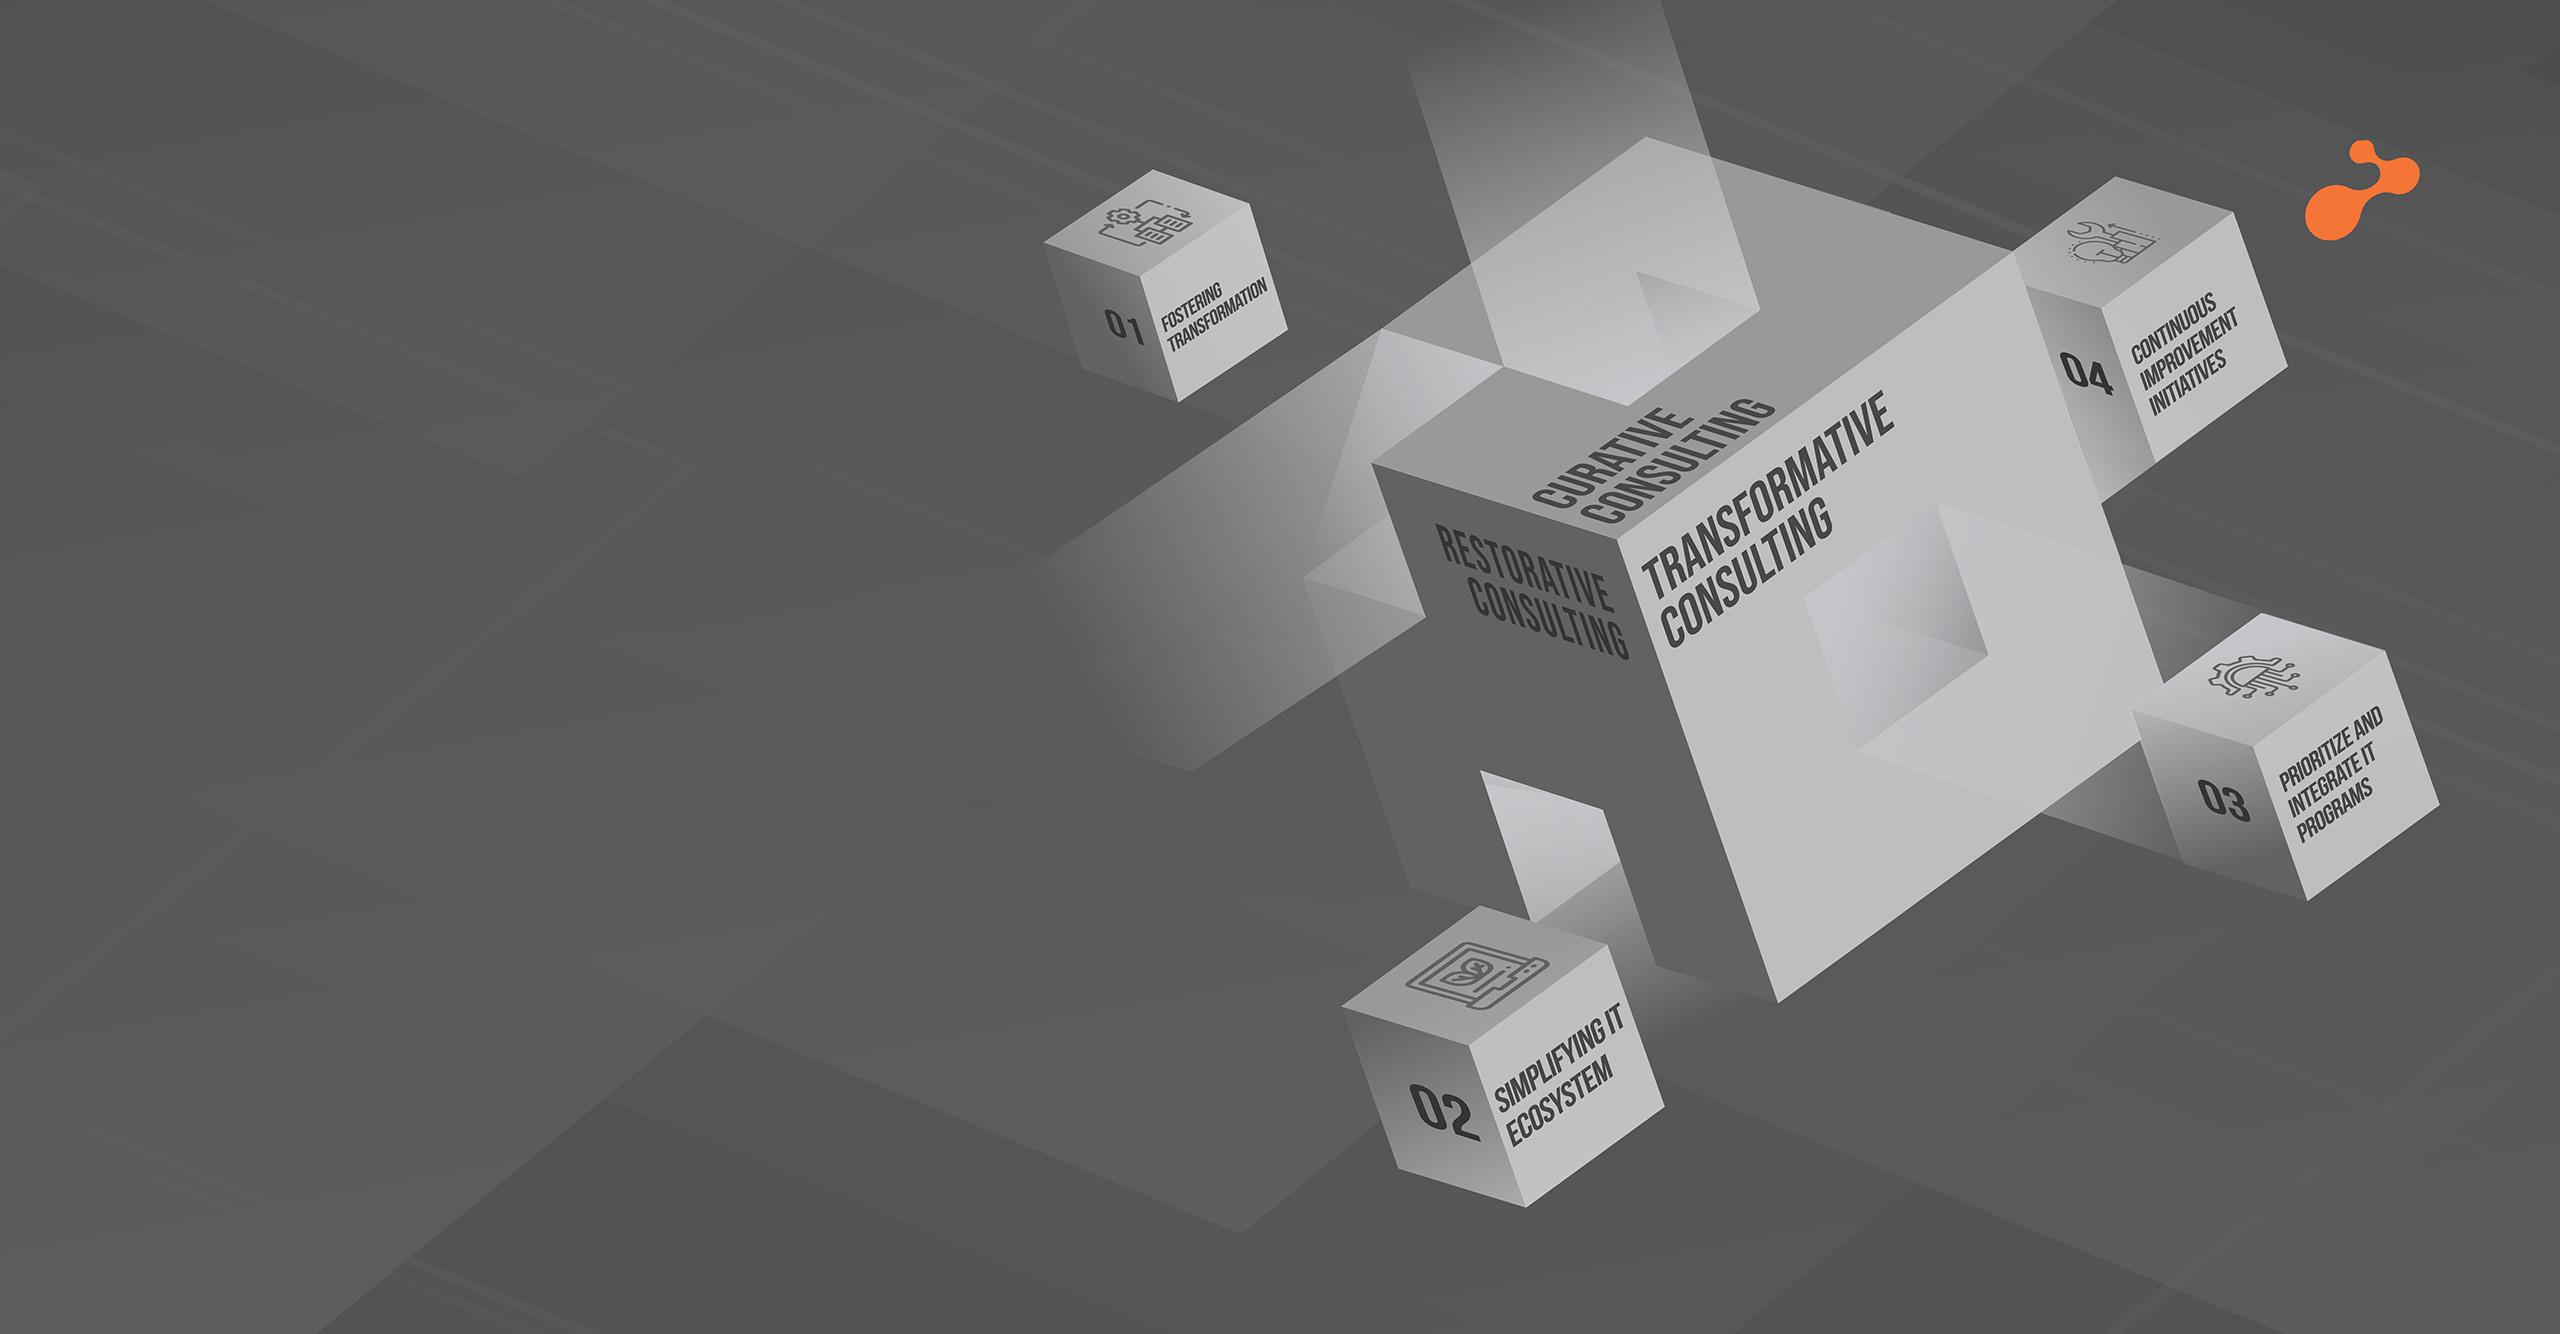 Digital Transformation Powering Growth For Enterprises – 2022 & Beyond